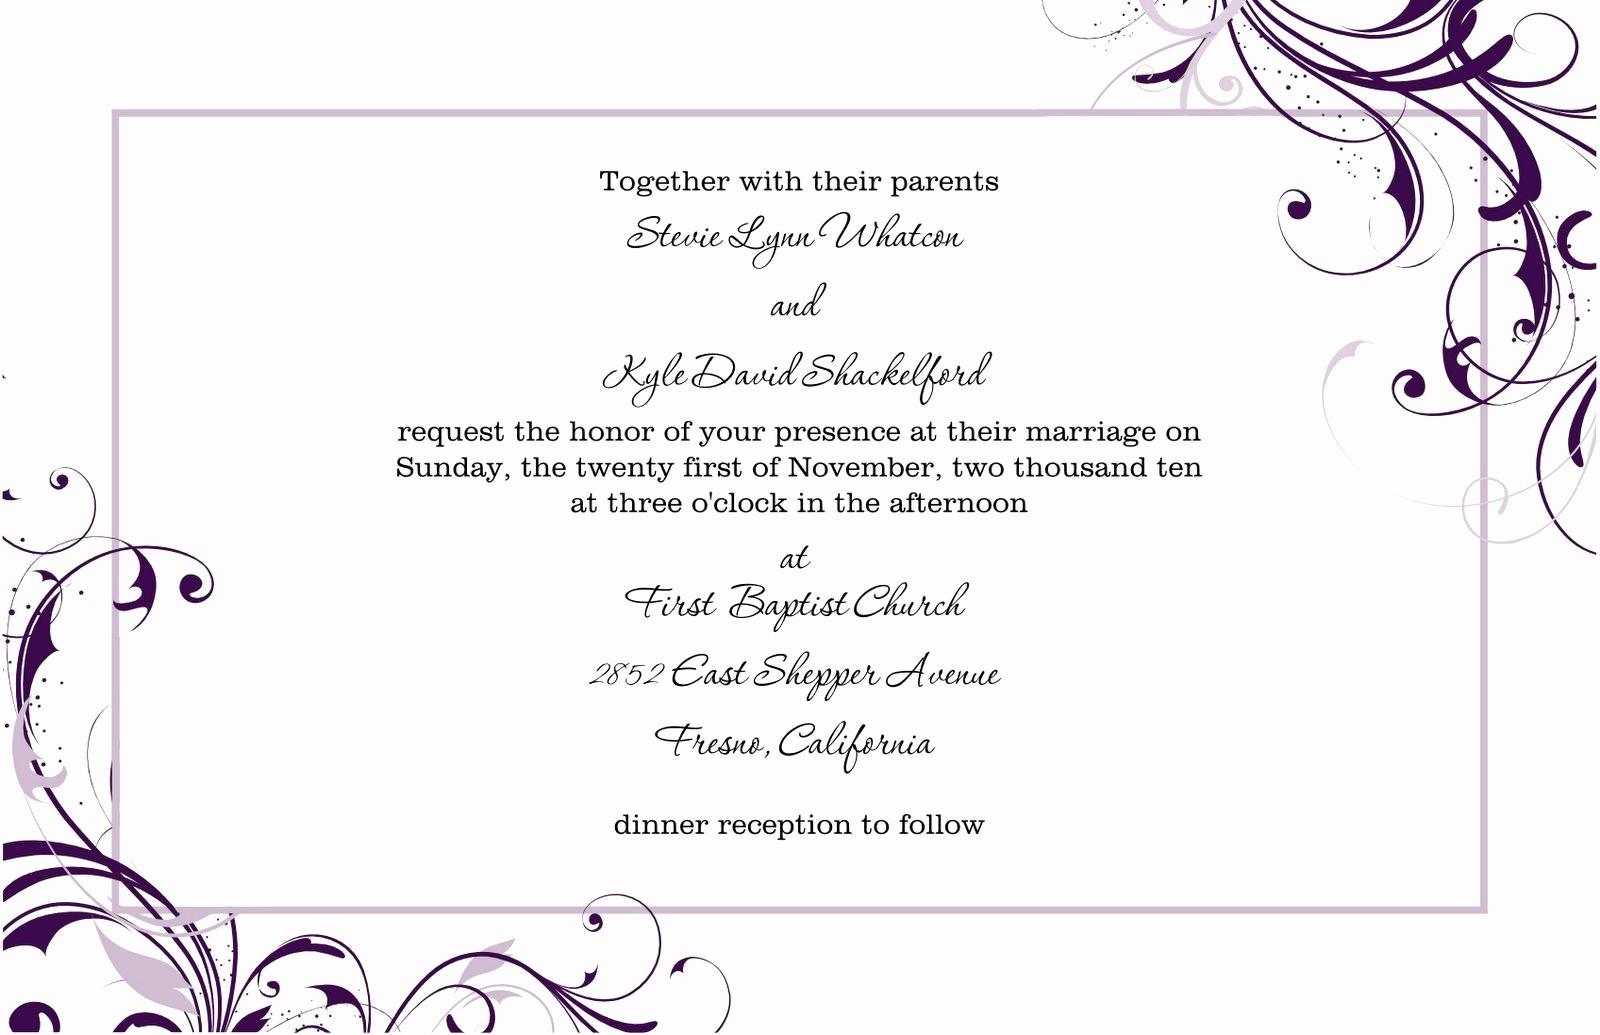 Party Invitations Templates Microsoft Word Beautiful Free Blank Wedding Invitation Templates for Microsoft Word